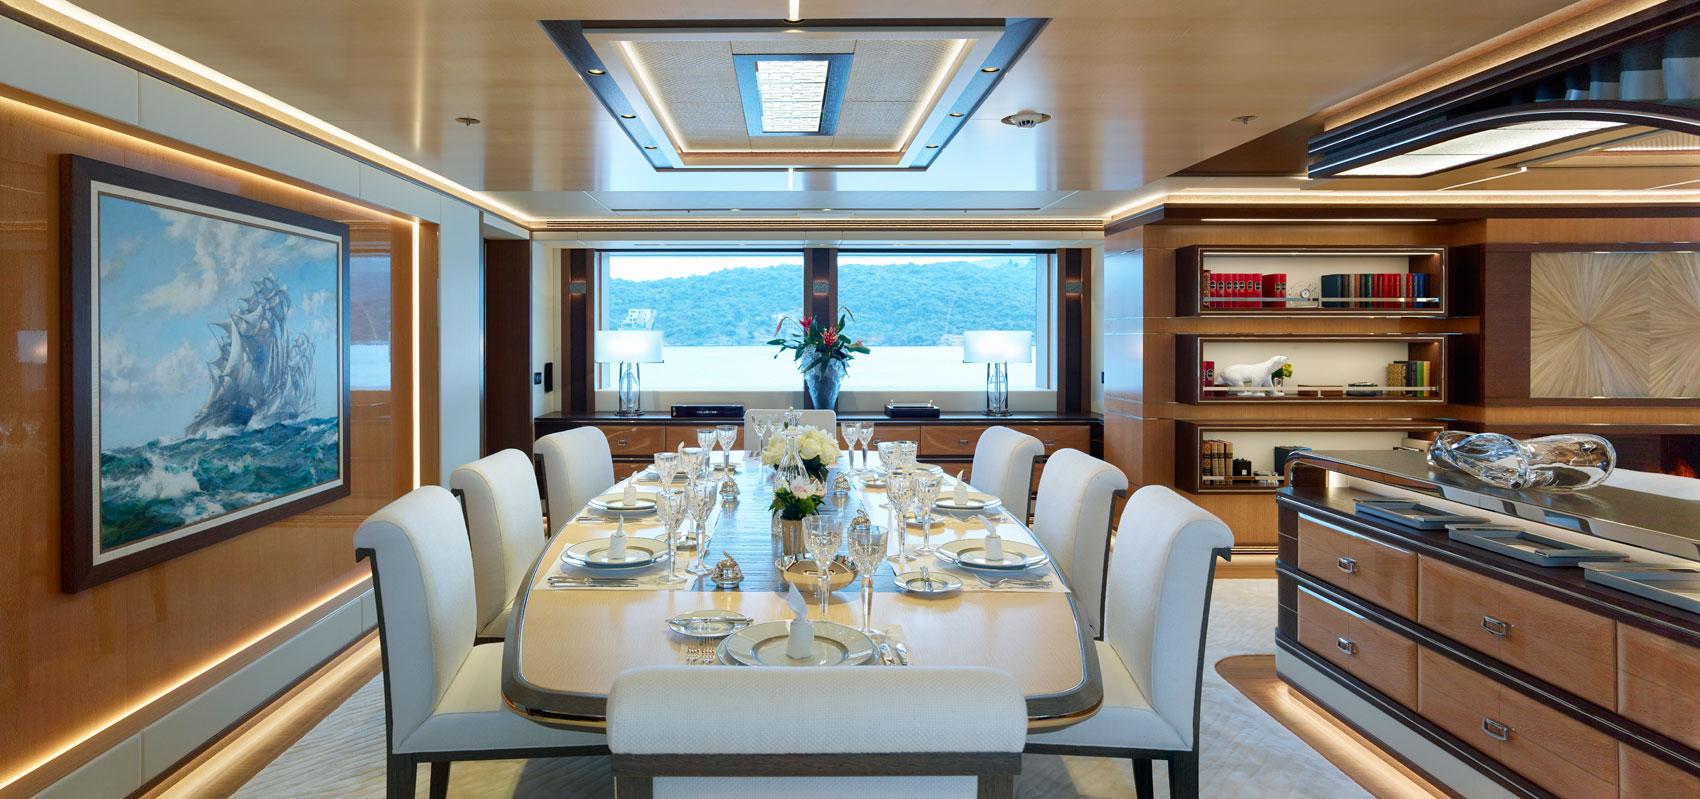 An Amazing Experience In The Côte d'Azur Aboard The Heesen Galactica Super Nova 8